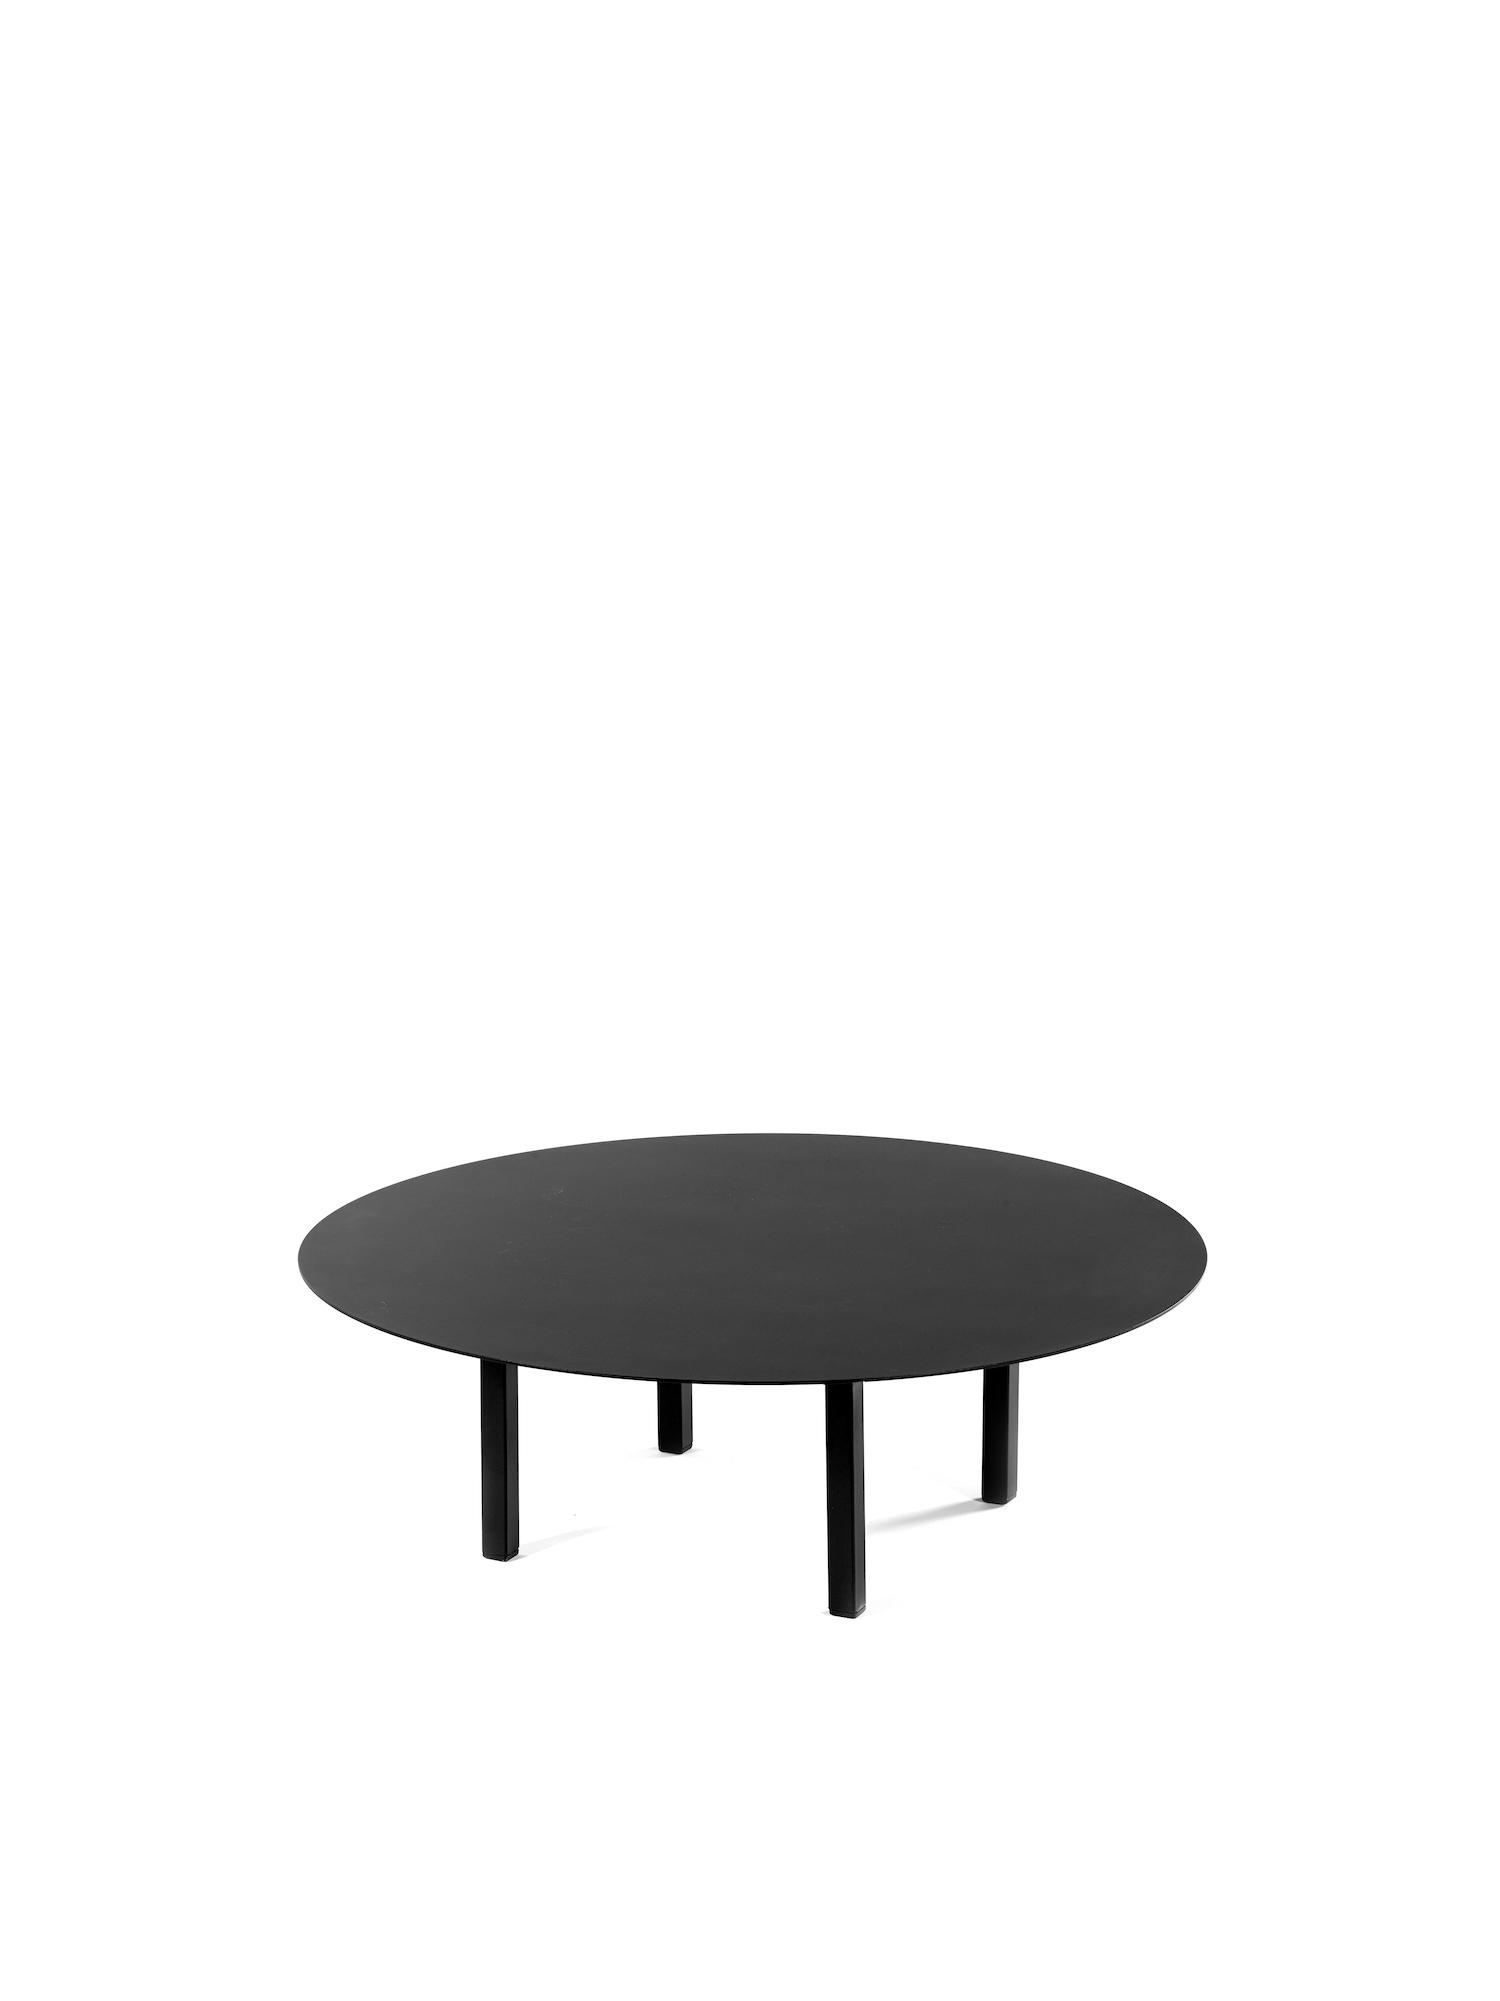 Zwarte salontafel Bea Mombaers Serax.jpg